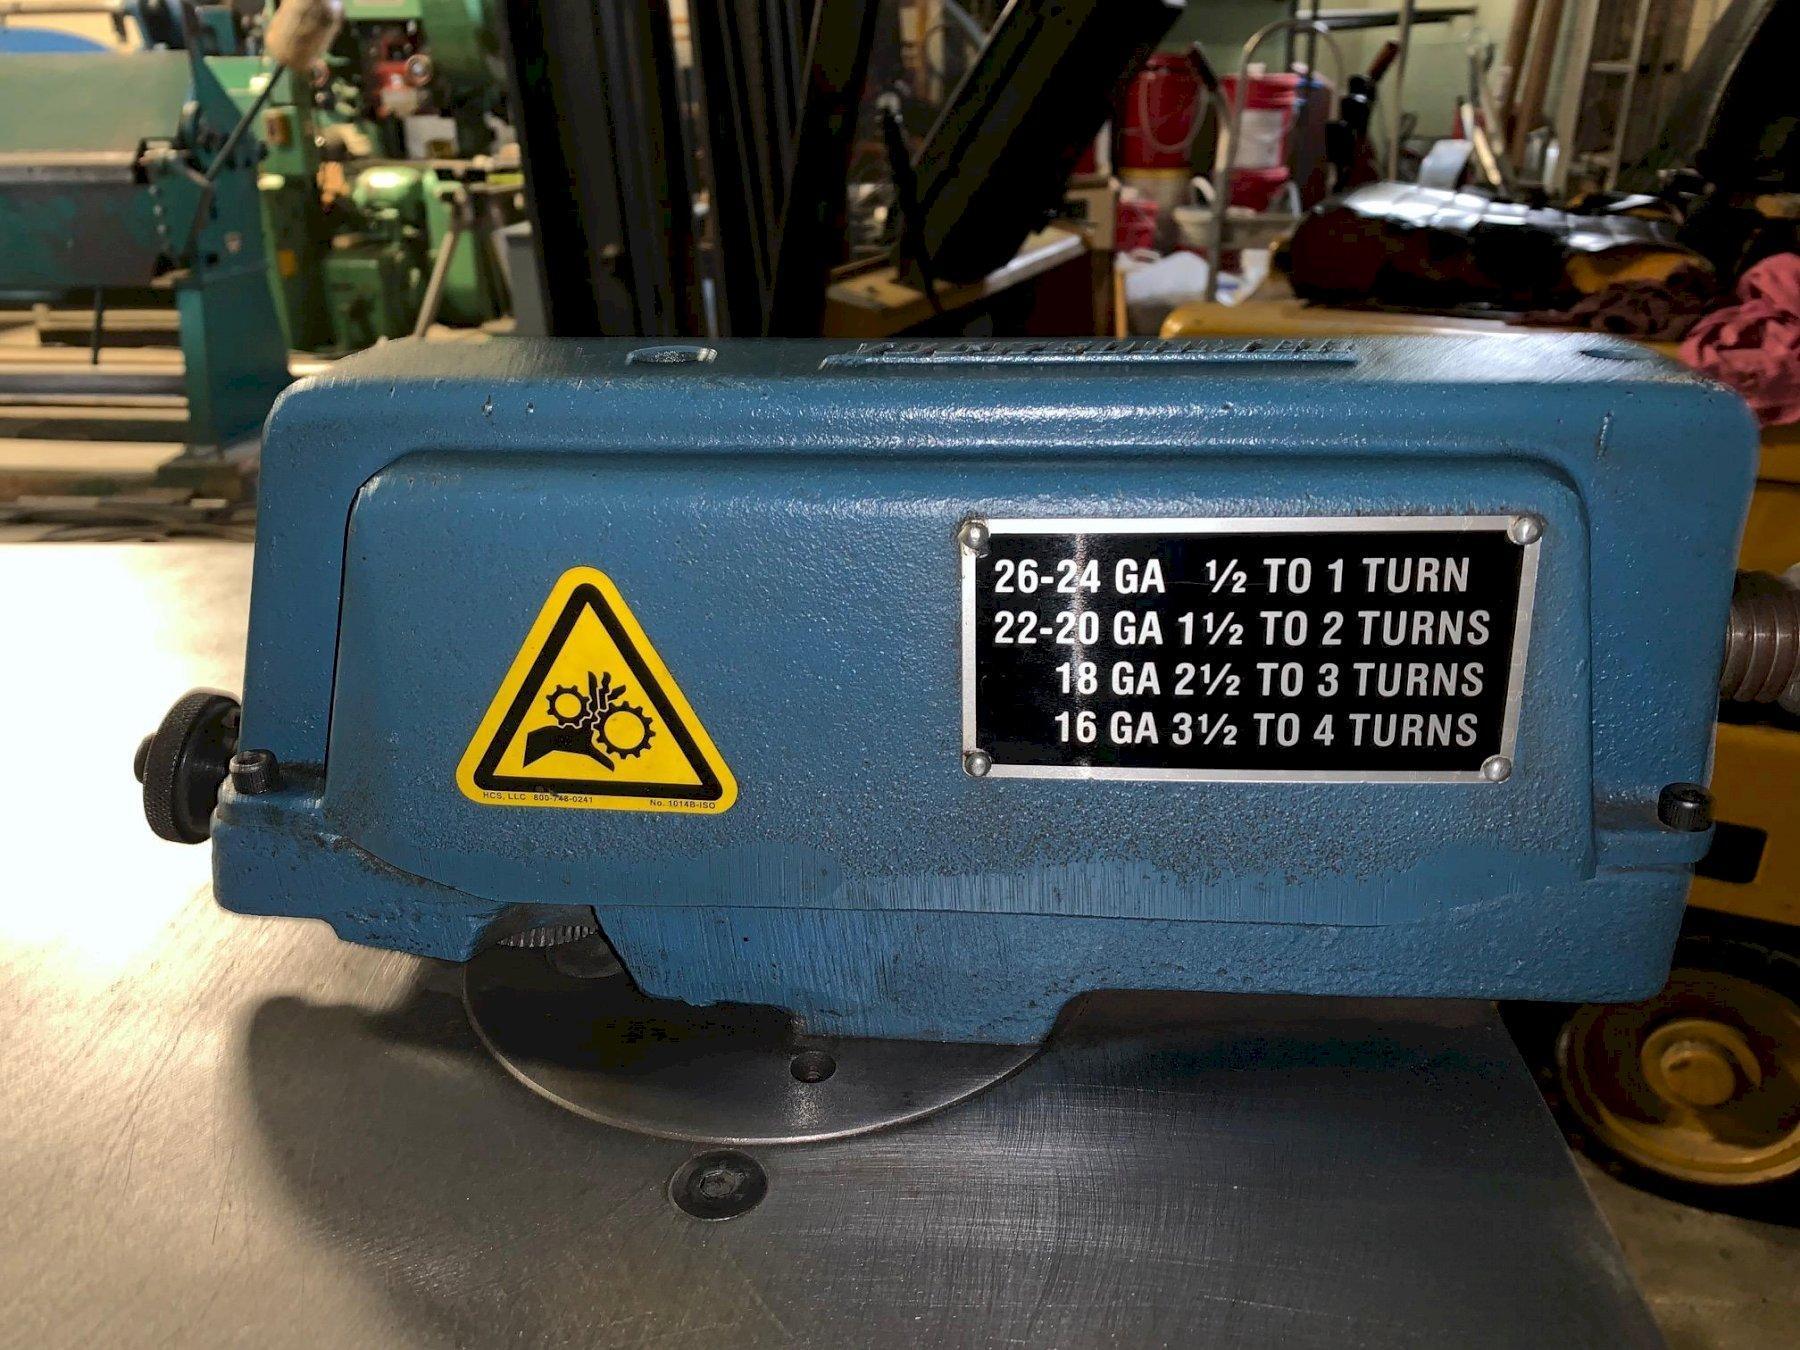 16 Ga Used Lockformer Auto Guide Power Flanger